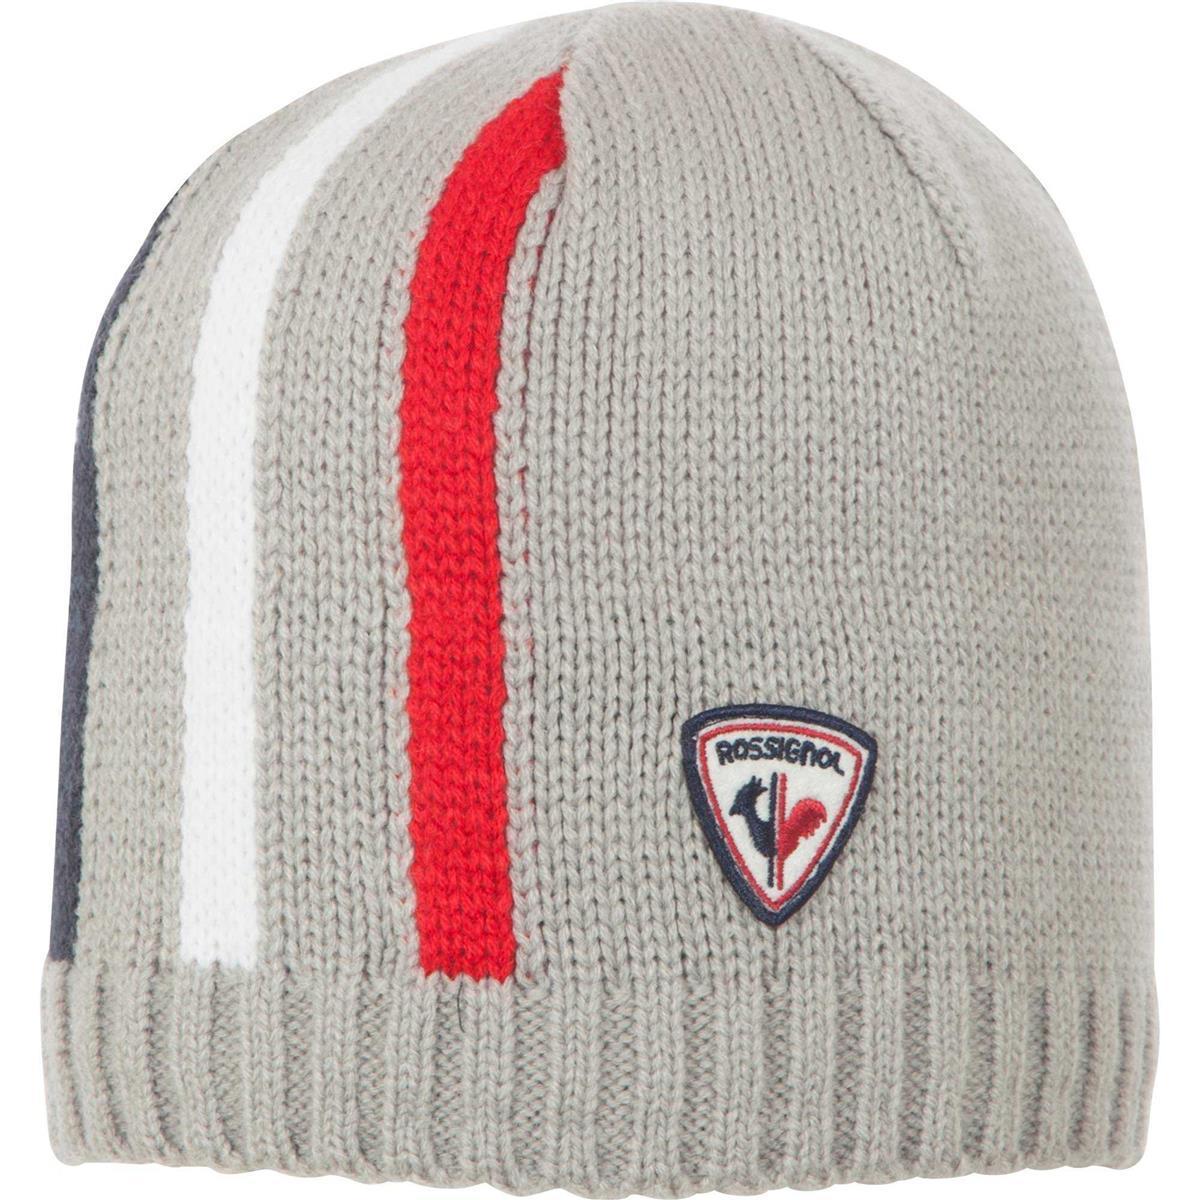 1348df5c Rossignol L3 Mel · Nordic ski hats ...